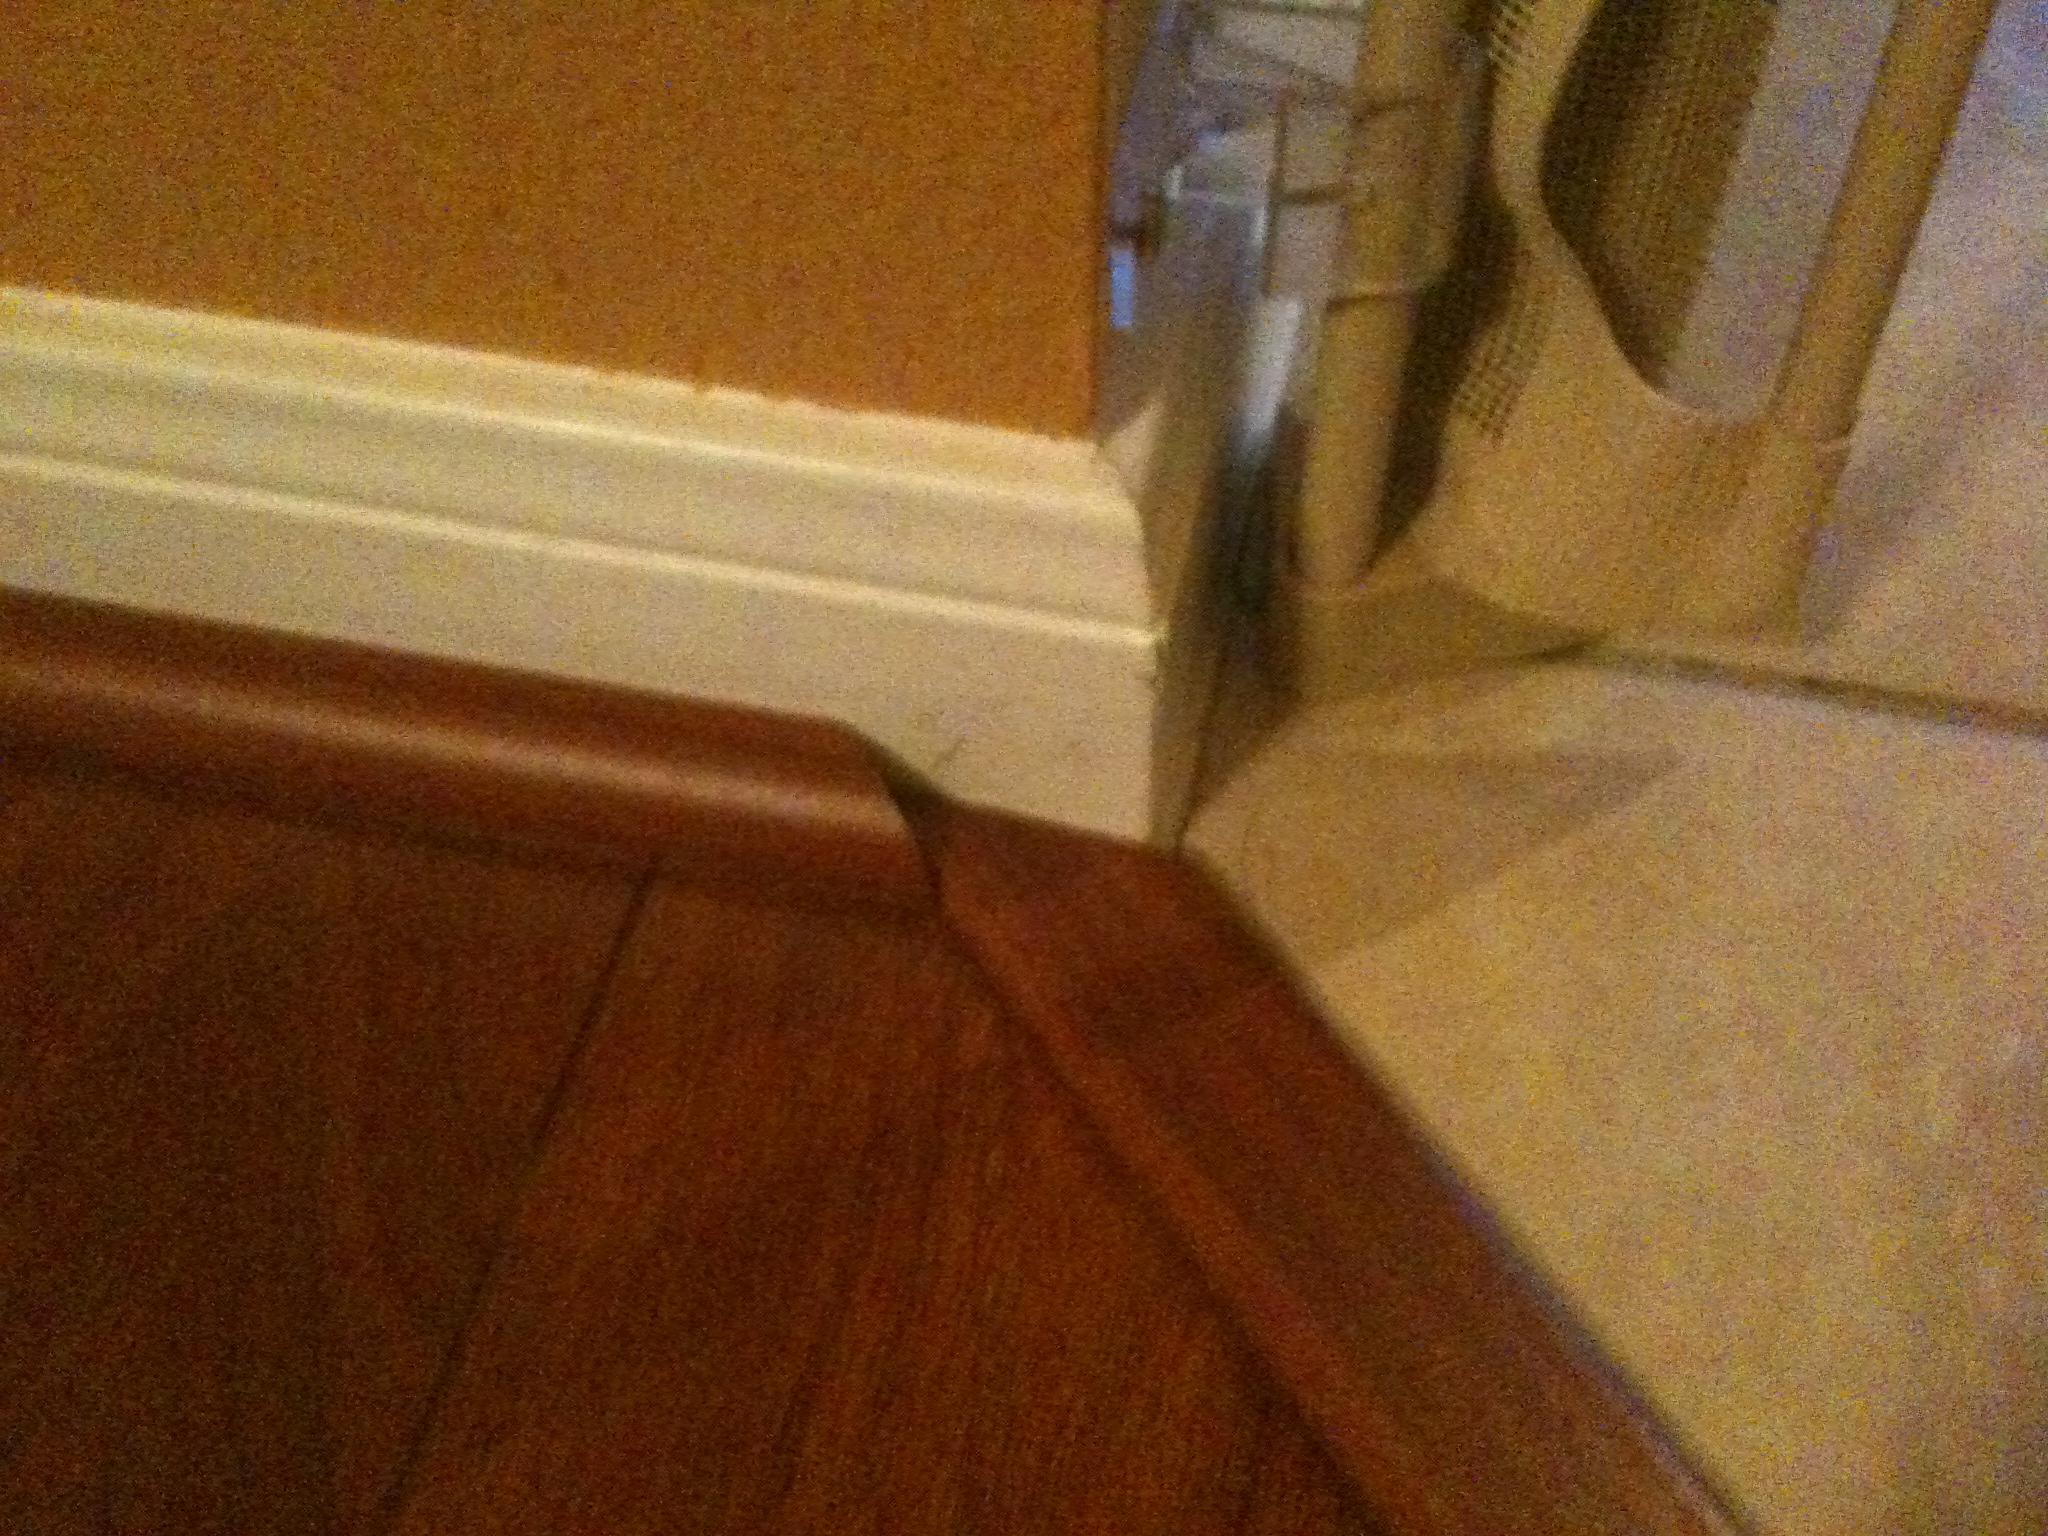 Baseboard Or Quarter Round Over Wood Flooring Designs